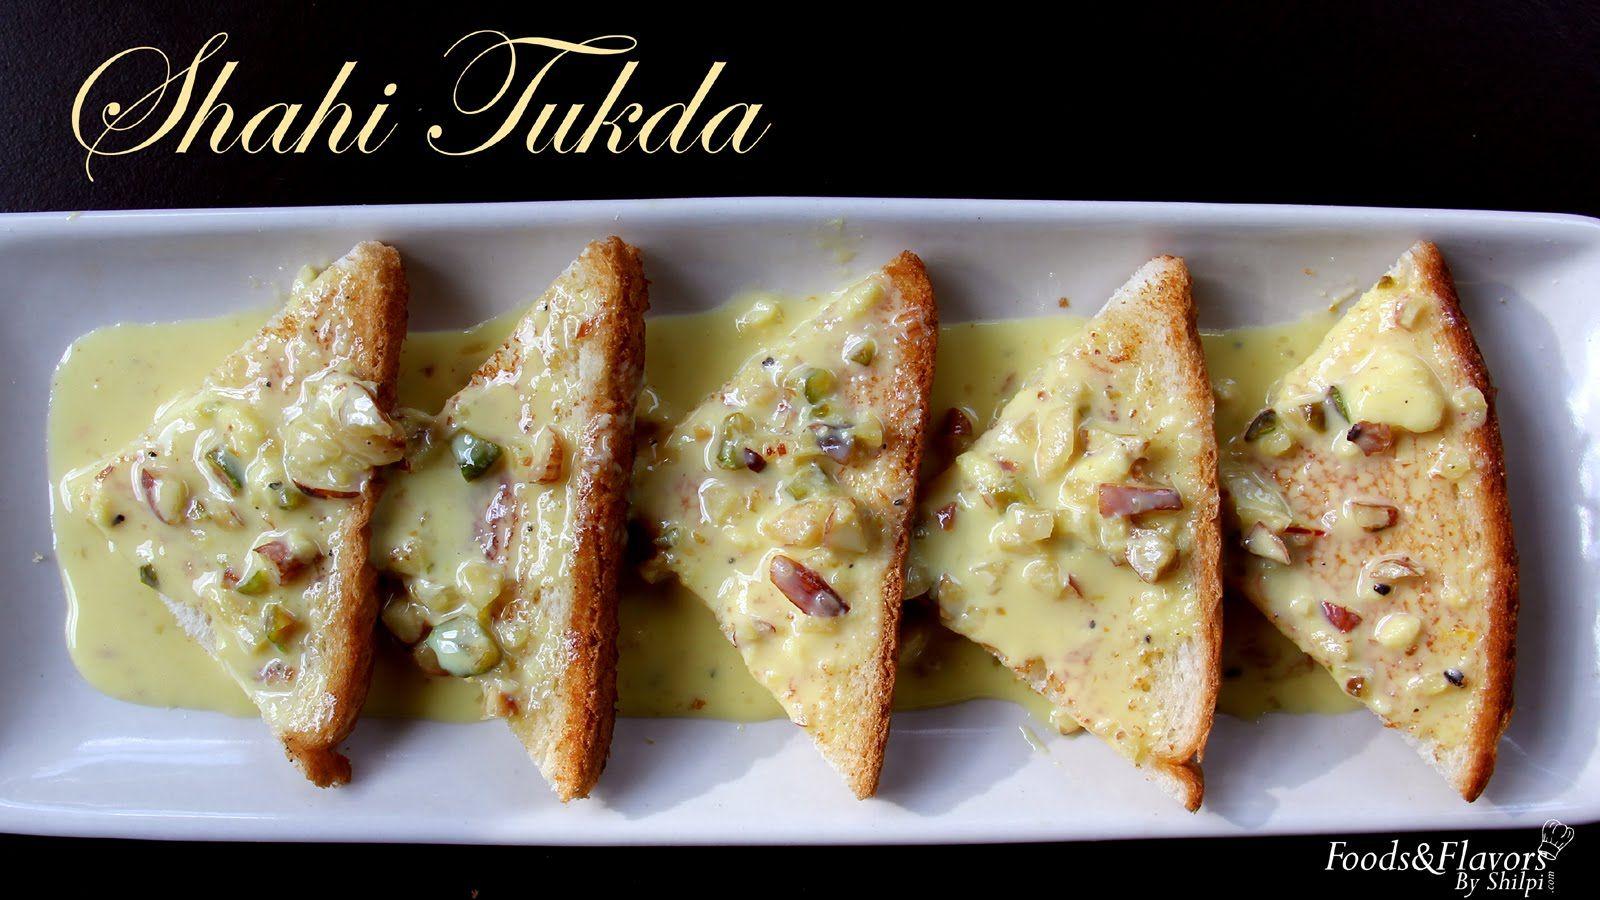 Sahi tukda recipe homemade indian sweets and dessert recipes by food sahi tukda recipe homemade indian sweets and dessert forumfinder Choice Image